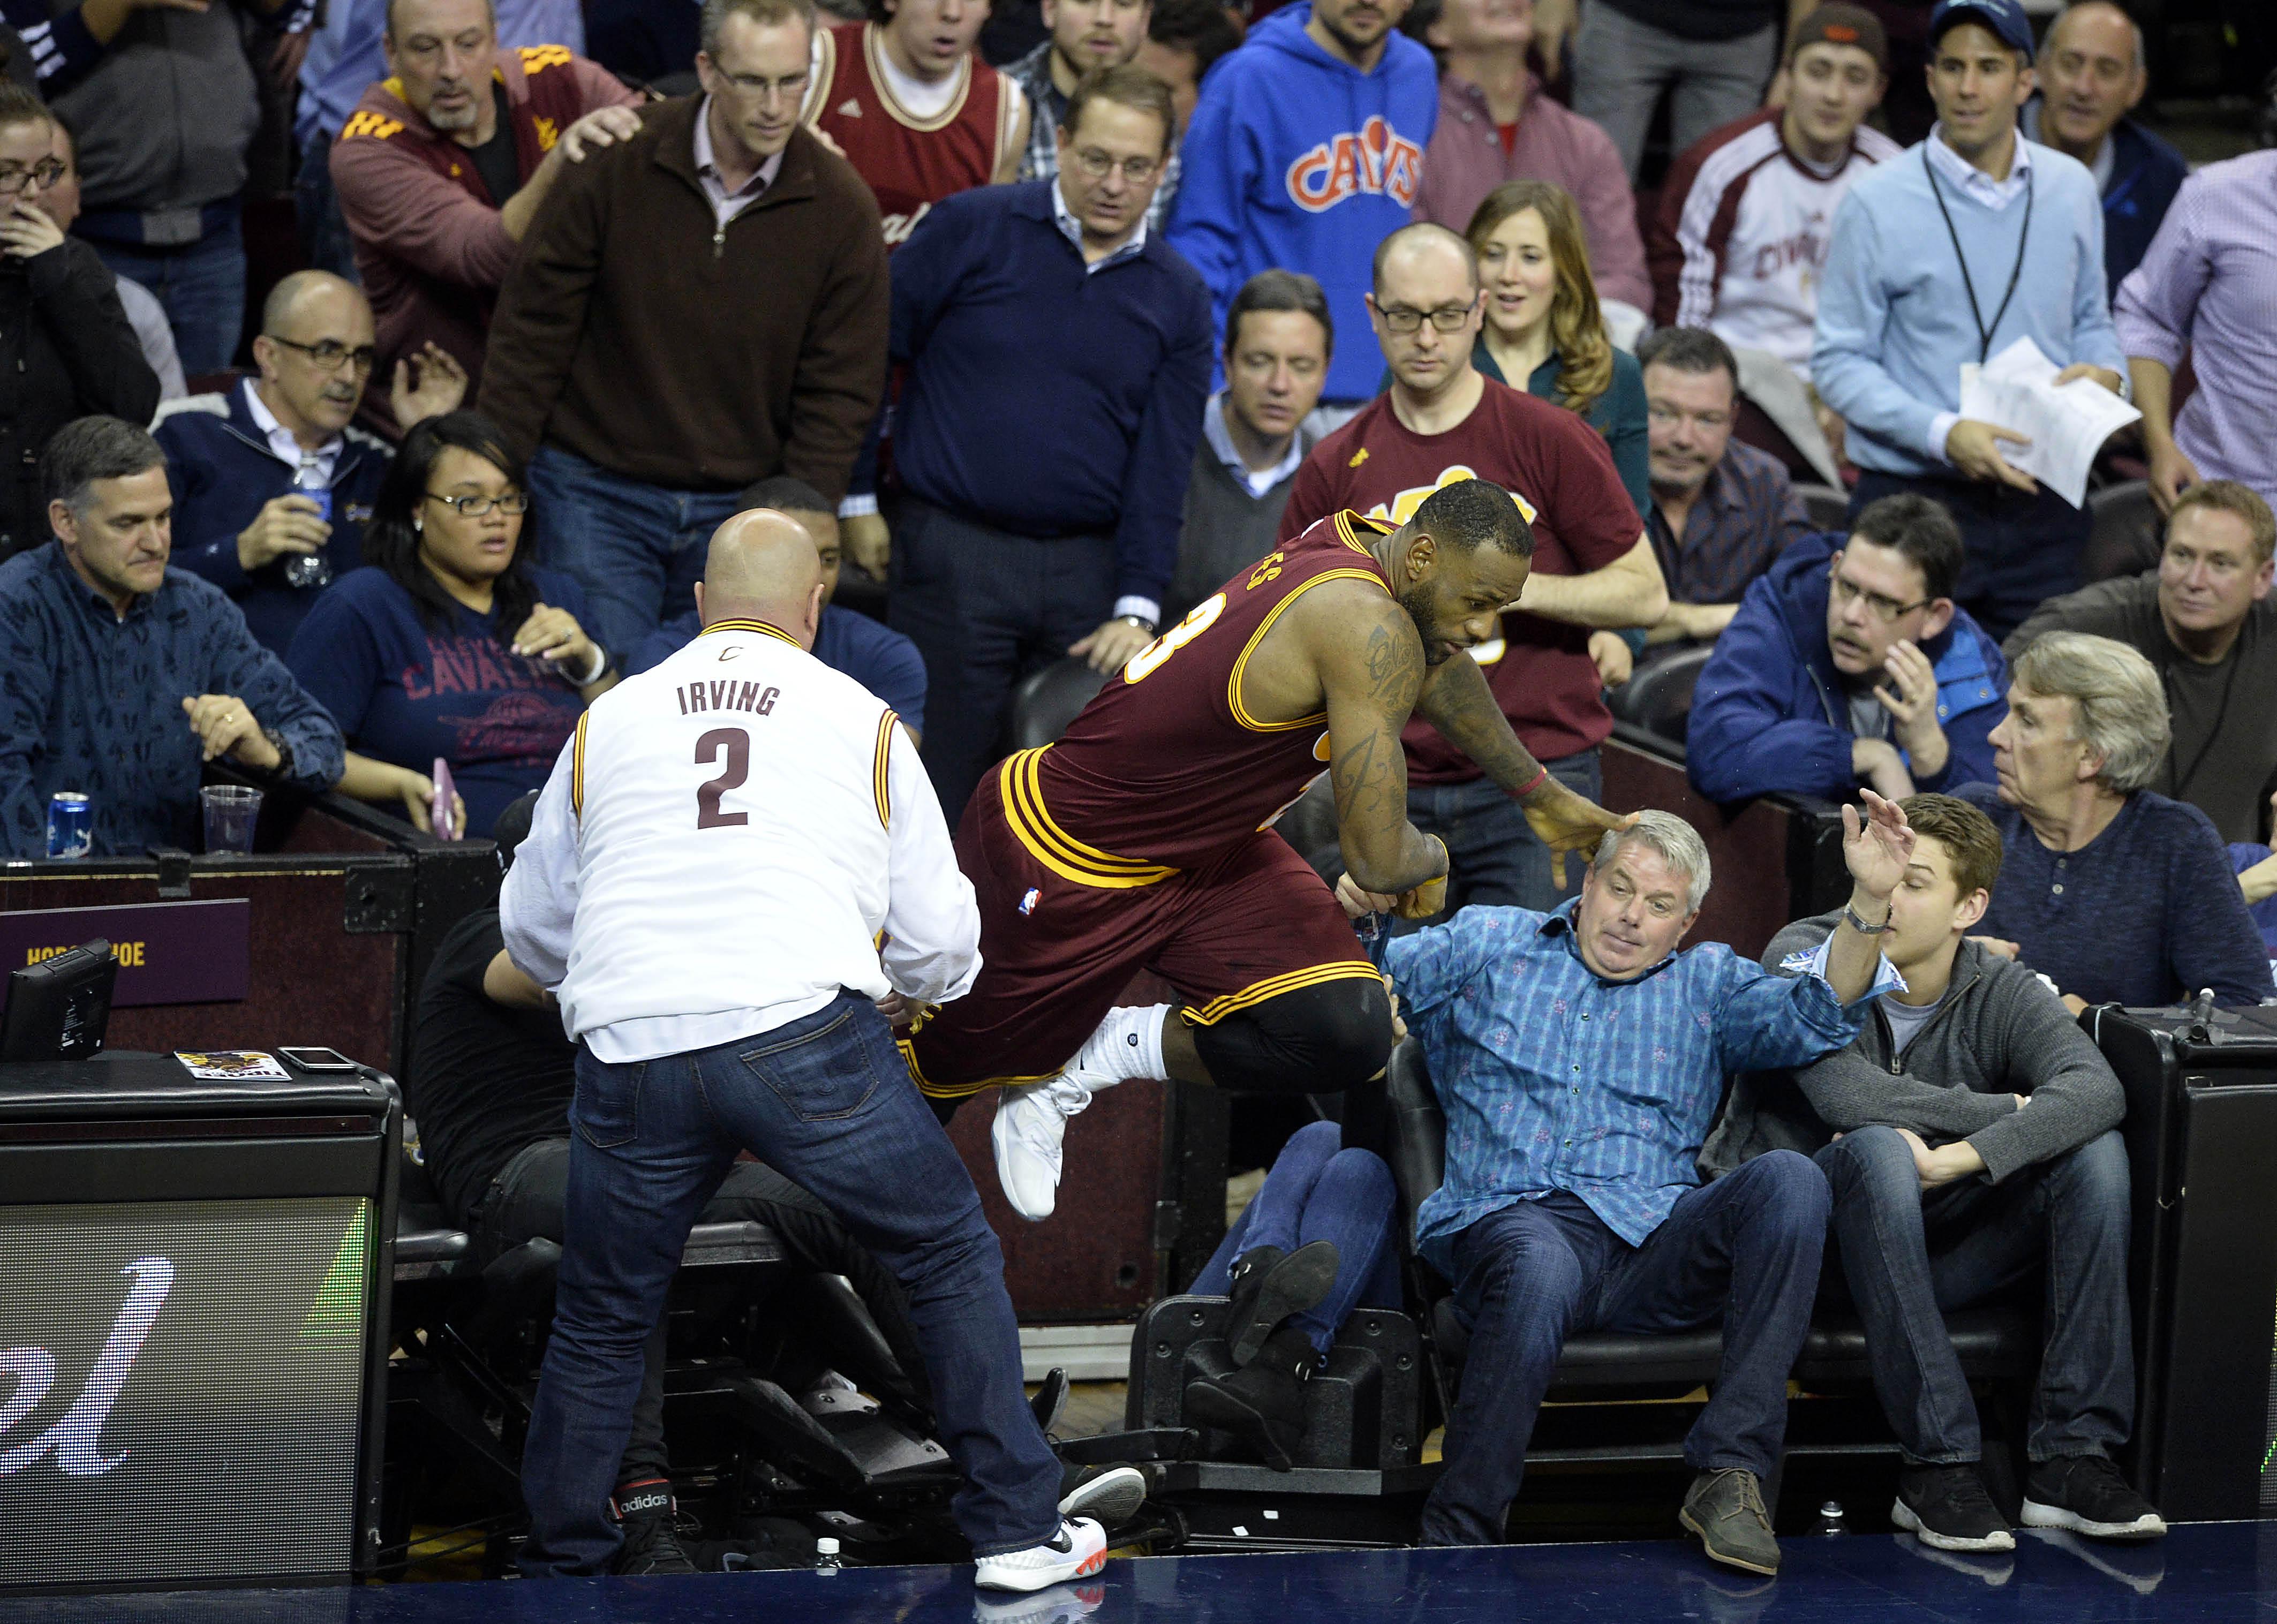 abfe31ffbd4a LeBron James plows into crowd